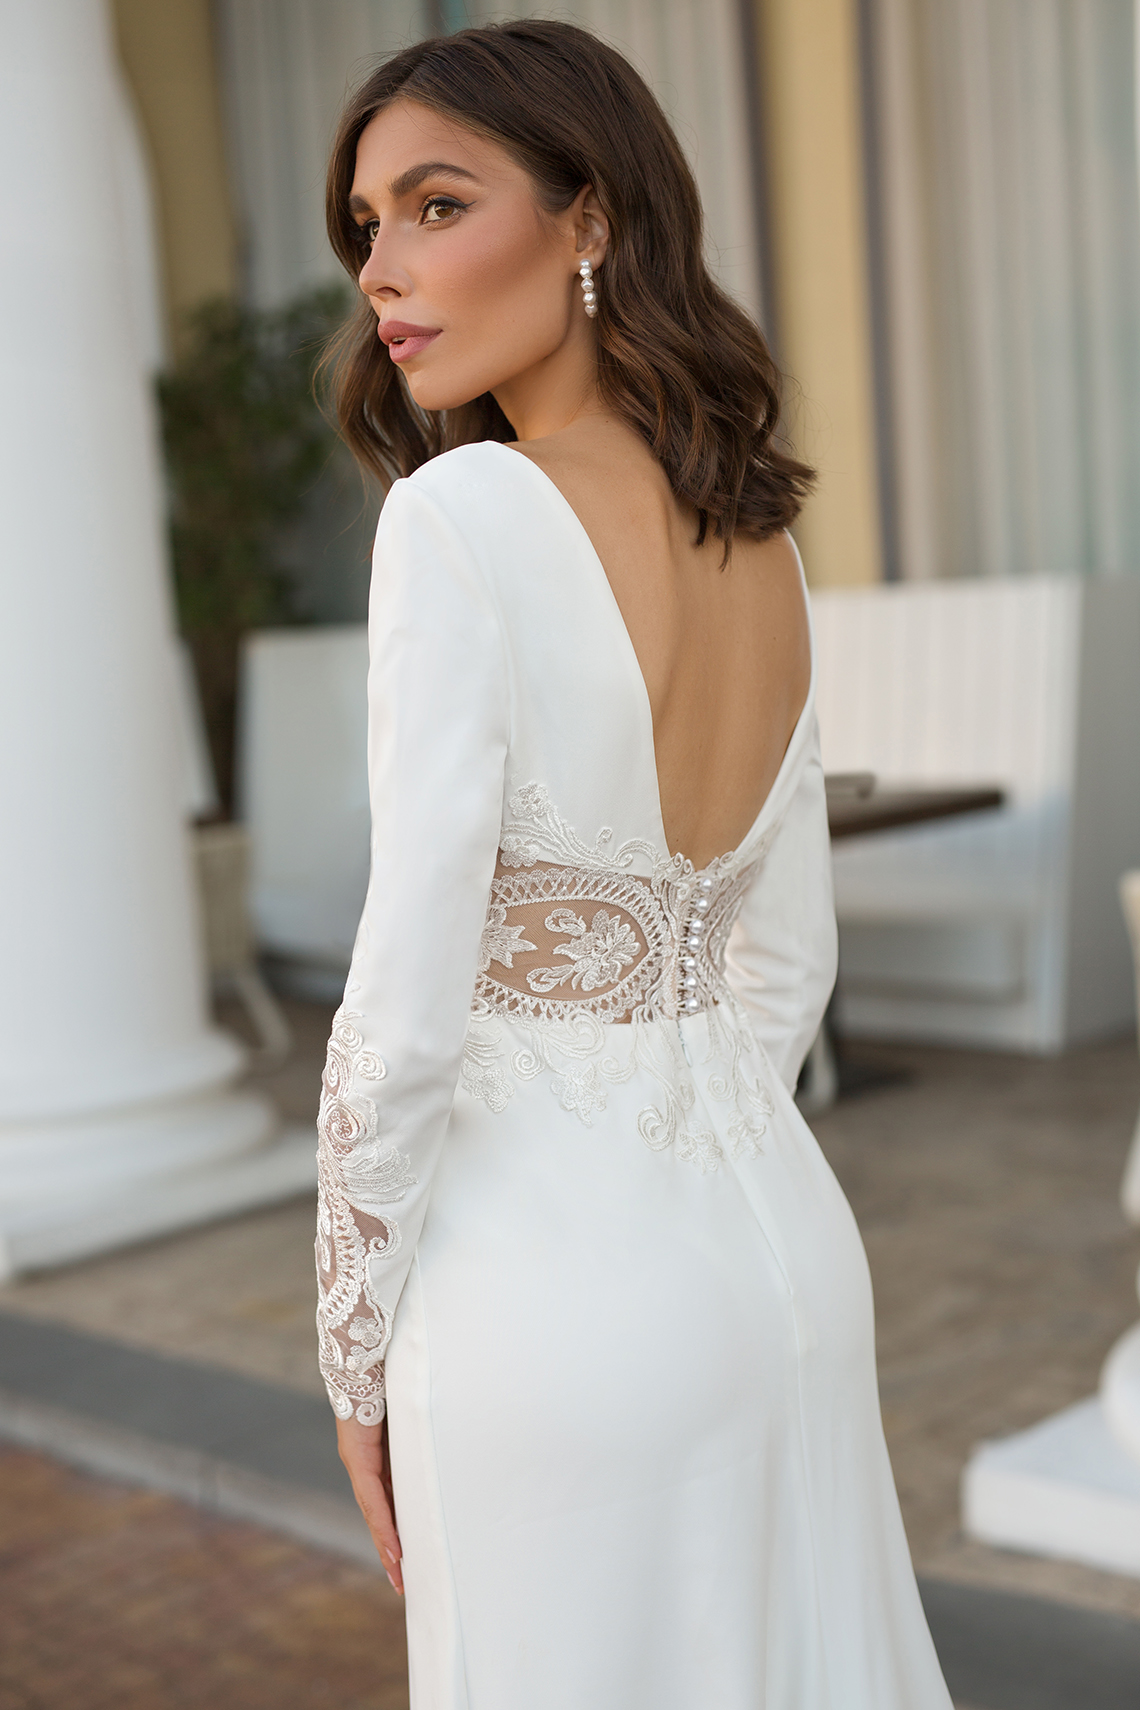 Feminine Simple Minimalistic Wedding Dresses by Mila Bridal 2020 2021 – Bridal Musings 41